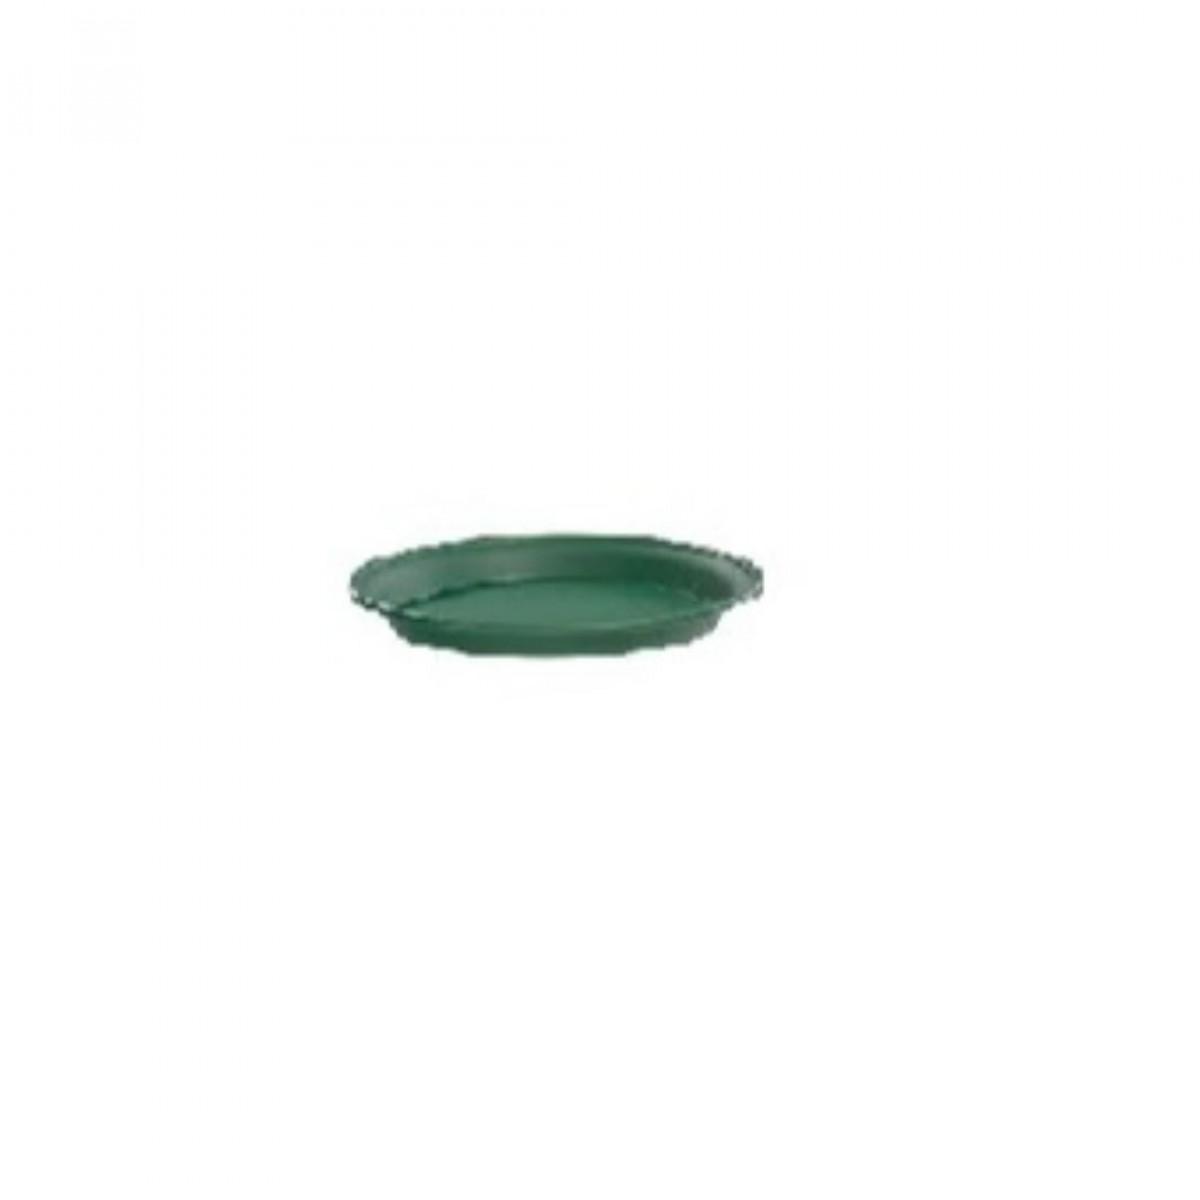 12CM Plastic Tray Green - 10 No